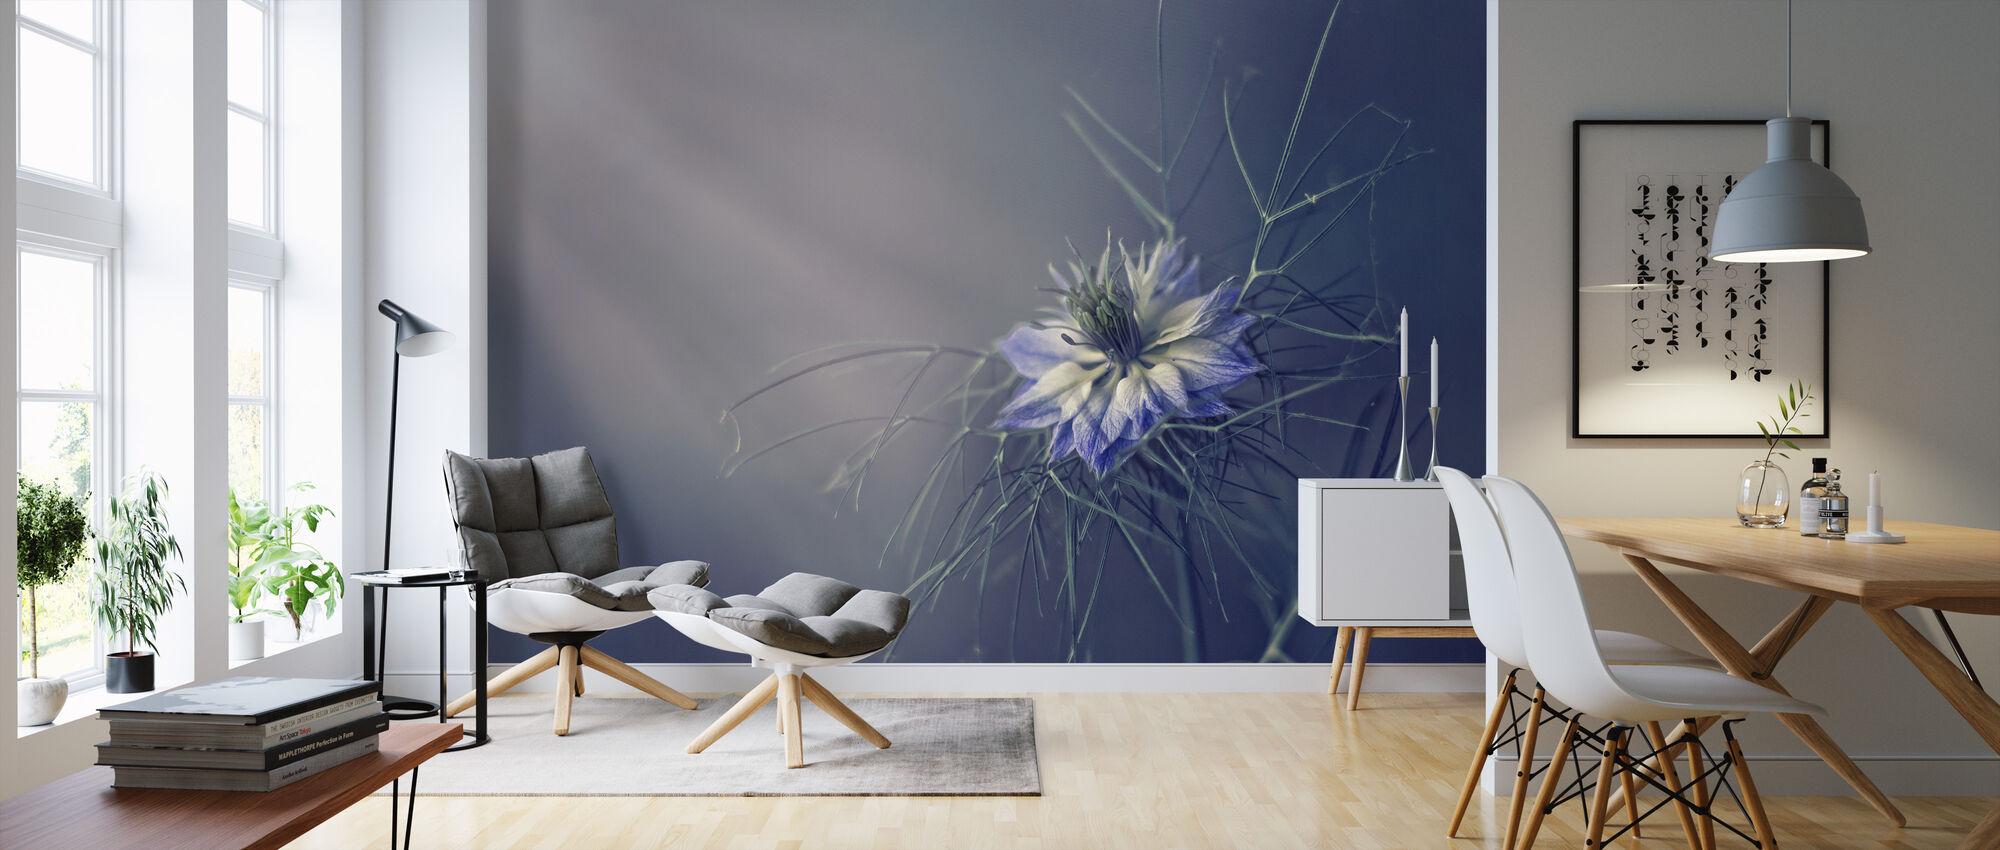 Prickly Blue - Wallpaper - Living Room